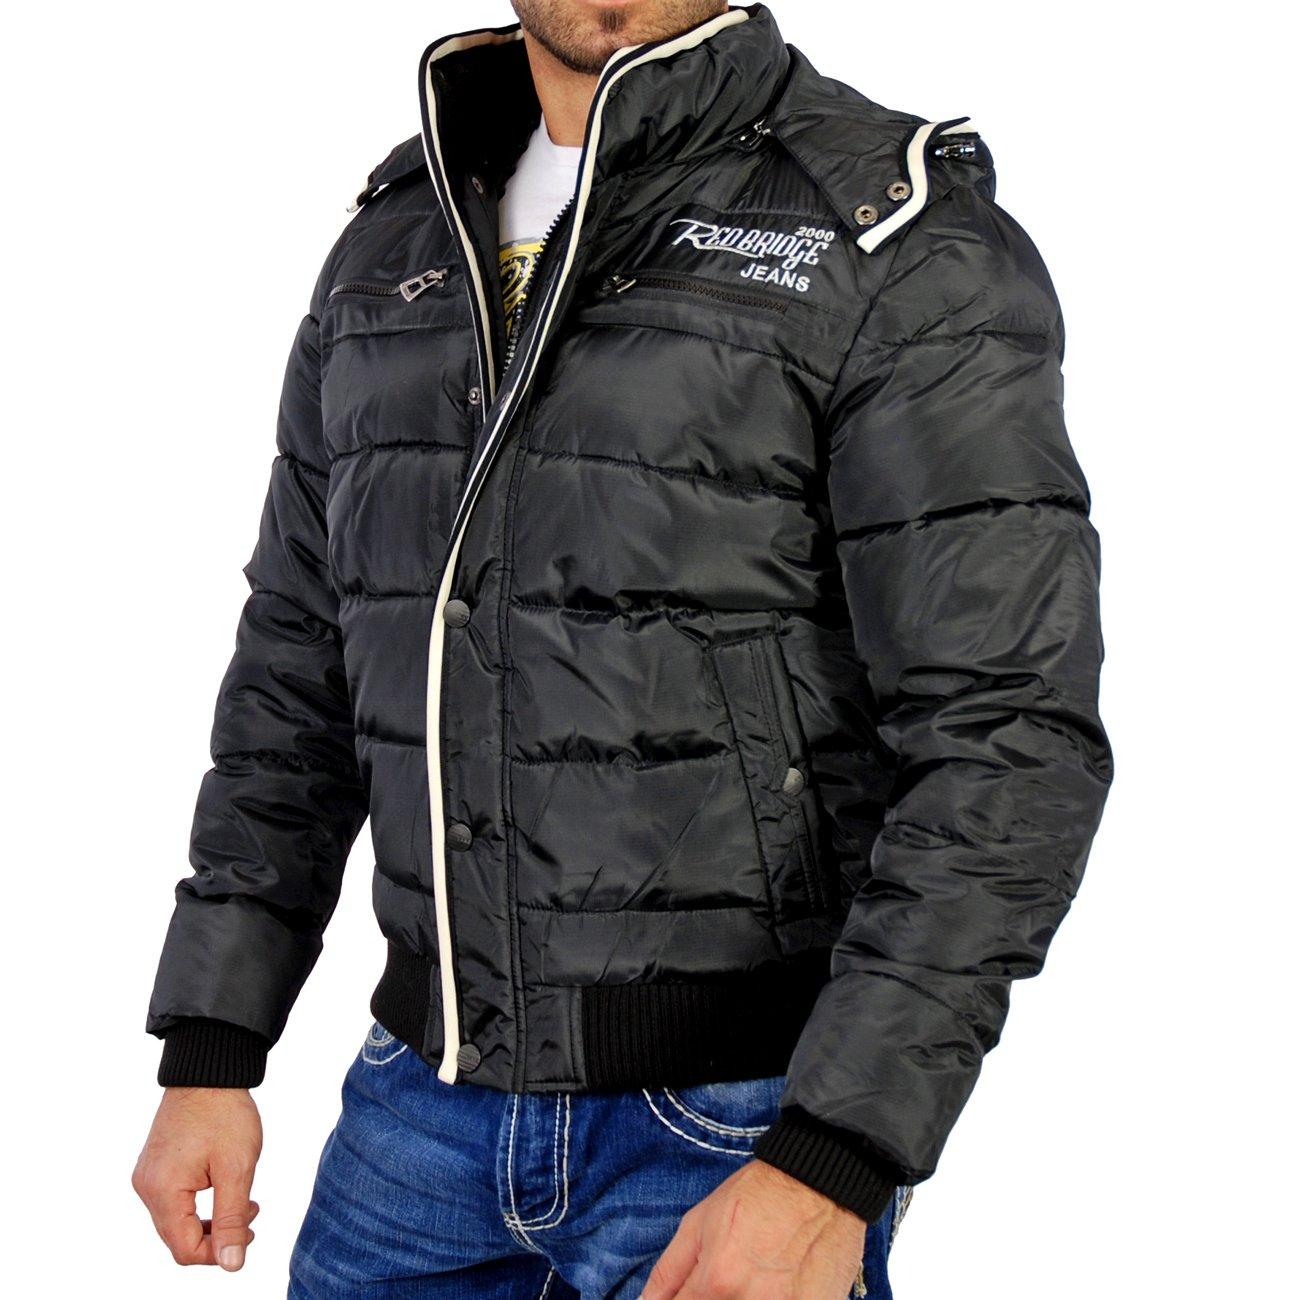 winterjacke herren redbridge 5202 kapuzenjacke kaufen